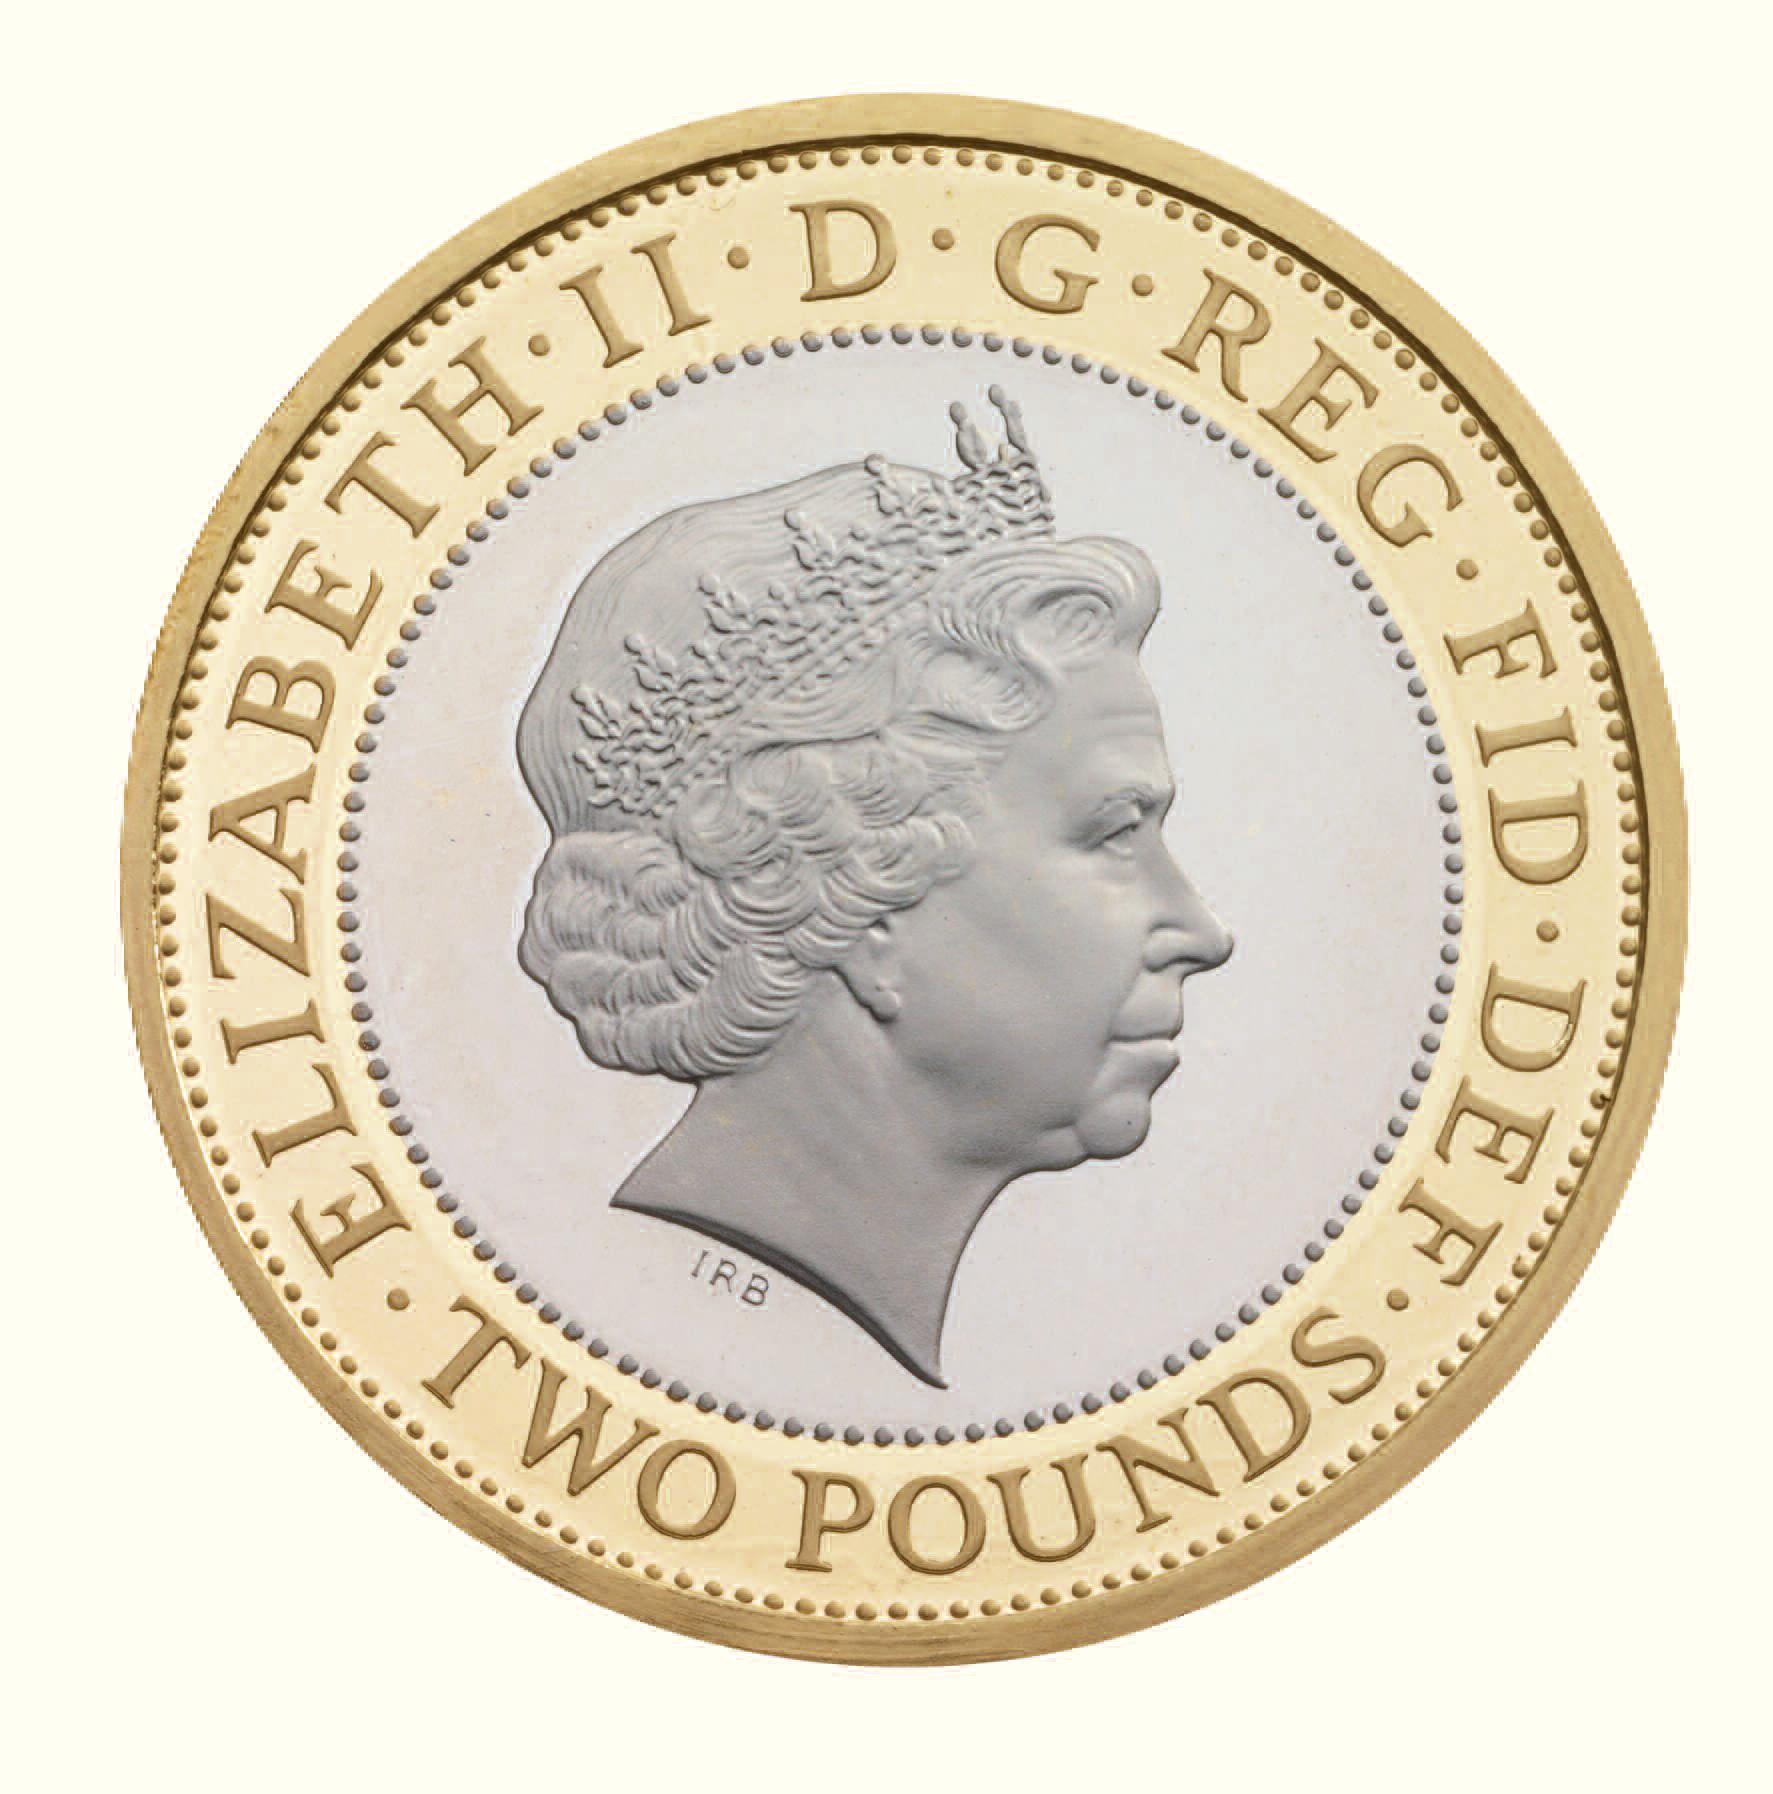 Монета 2 фунта стерлингов монета 50 euro cent 2002 года цена